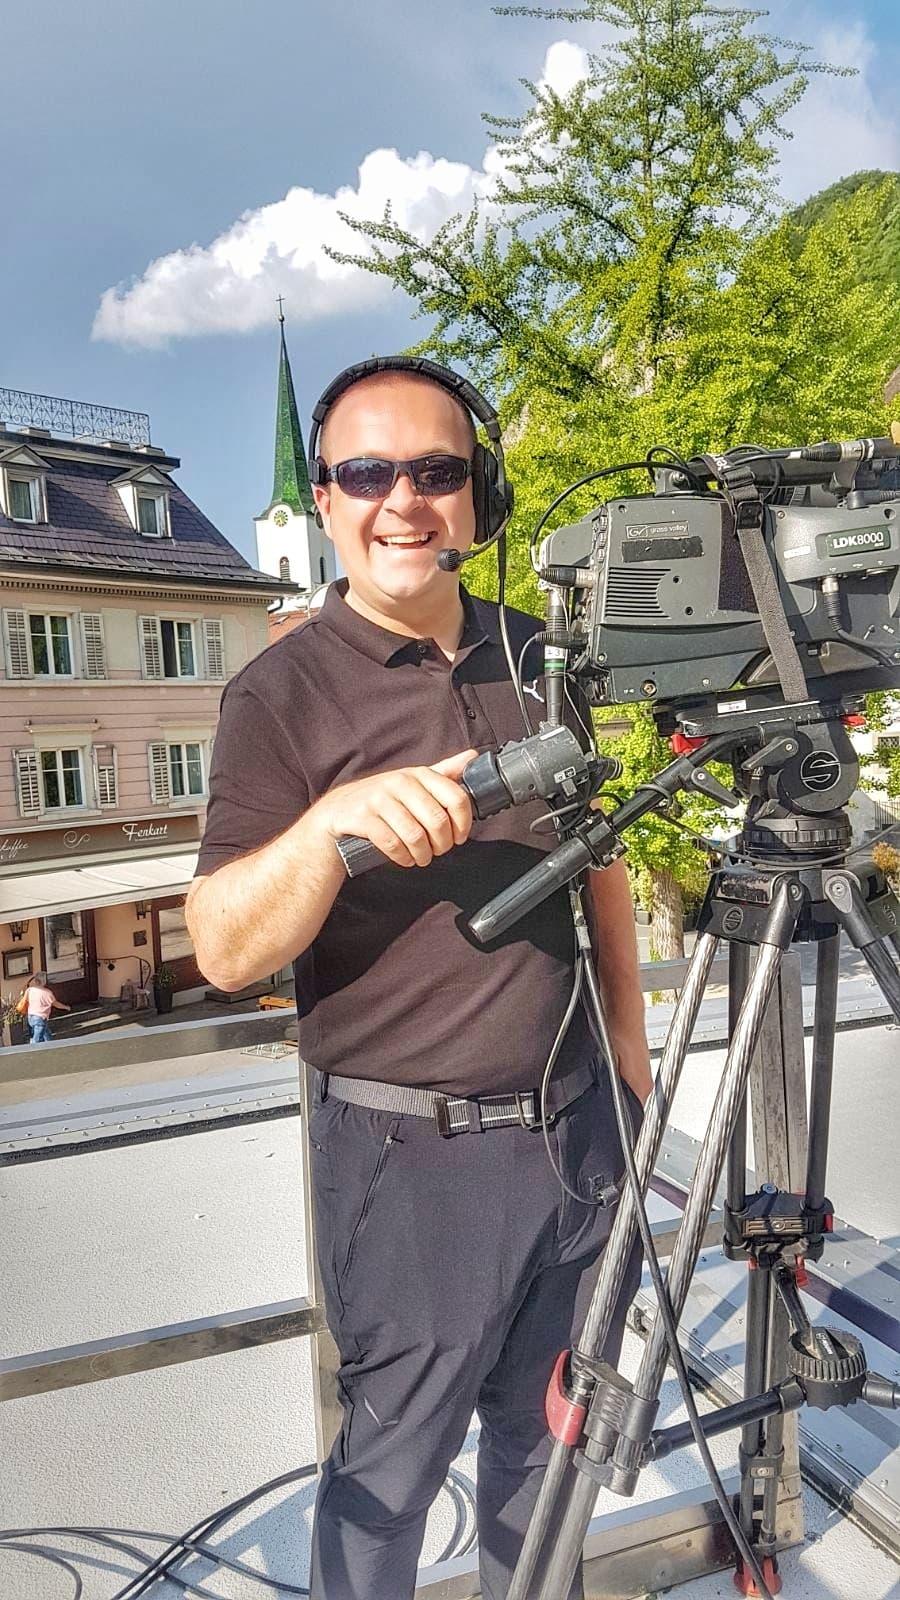 andreas felder kameramann orf unterwegs in österreich 06 NA - ORF Unterwegs in Österreich - Tirol